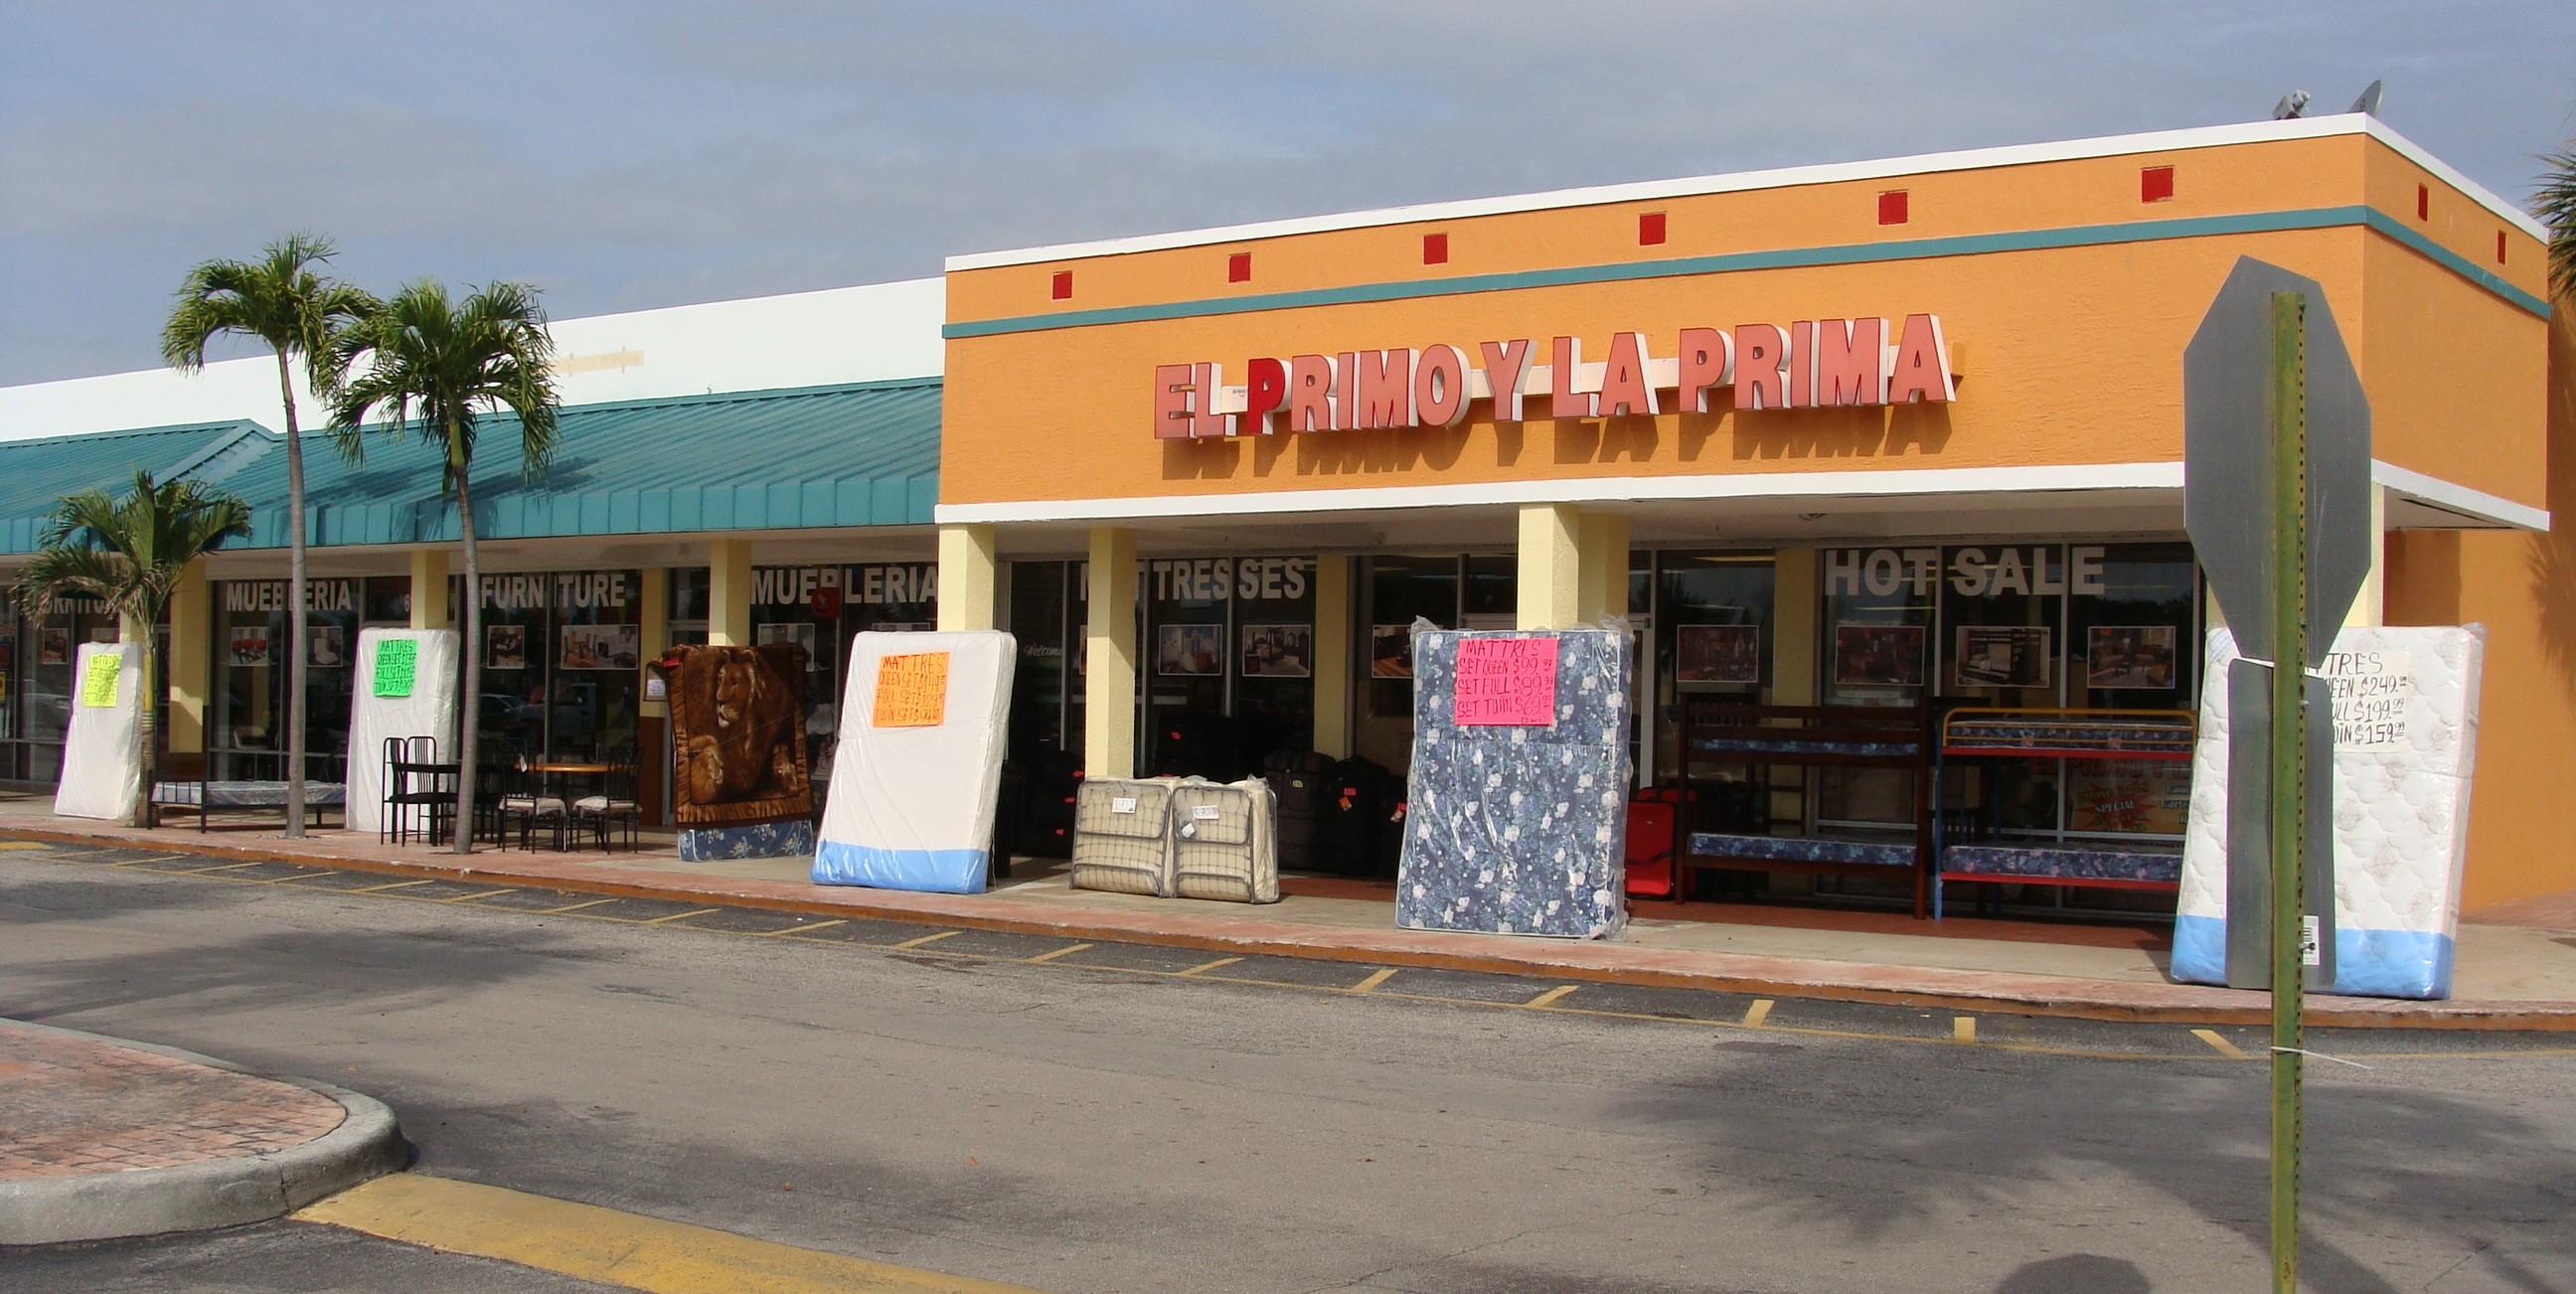 6158 – 64 South Congress Ave. <br /> Lantana, FL 33462 <br /> Tel: 561-649-0006